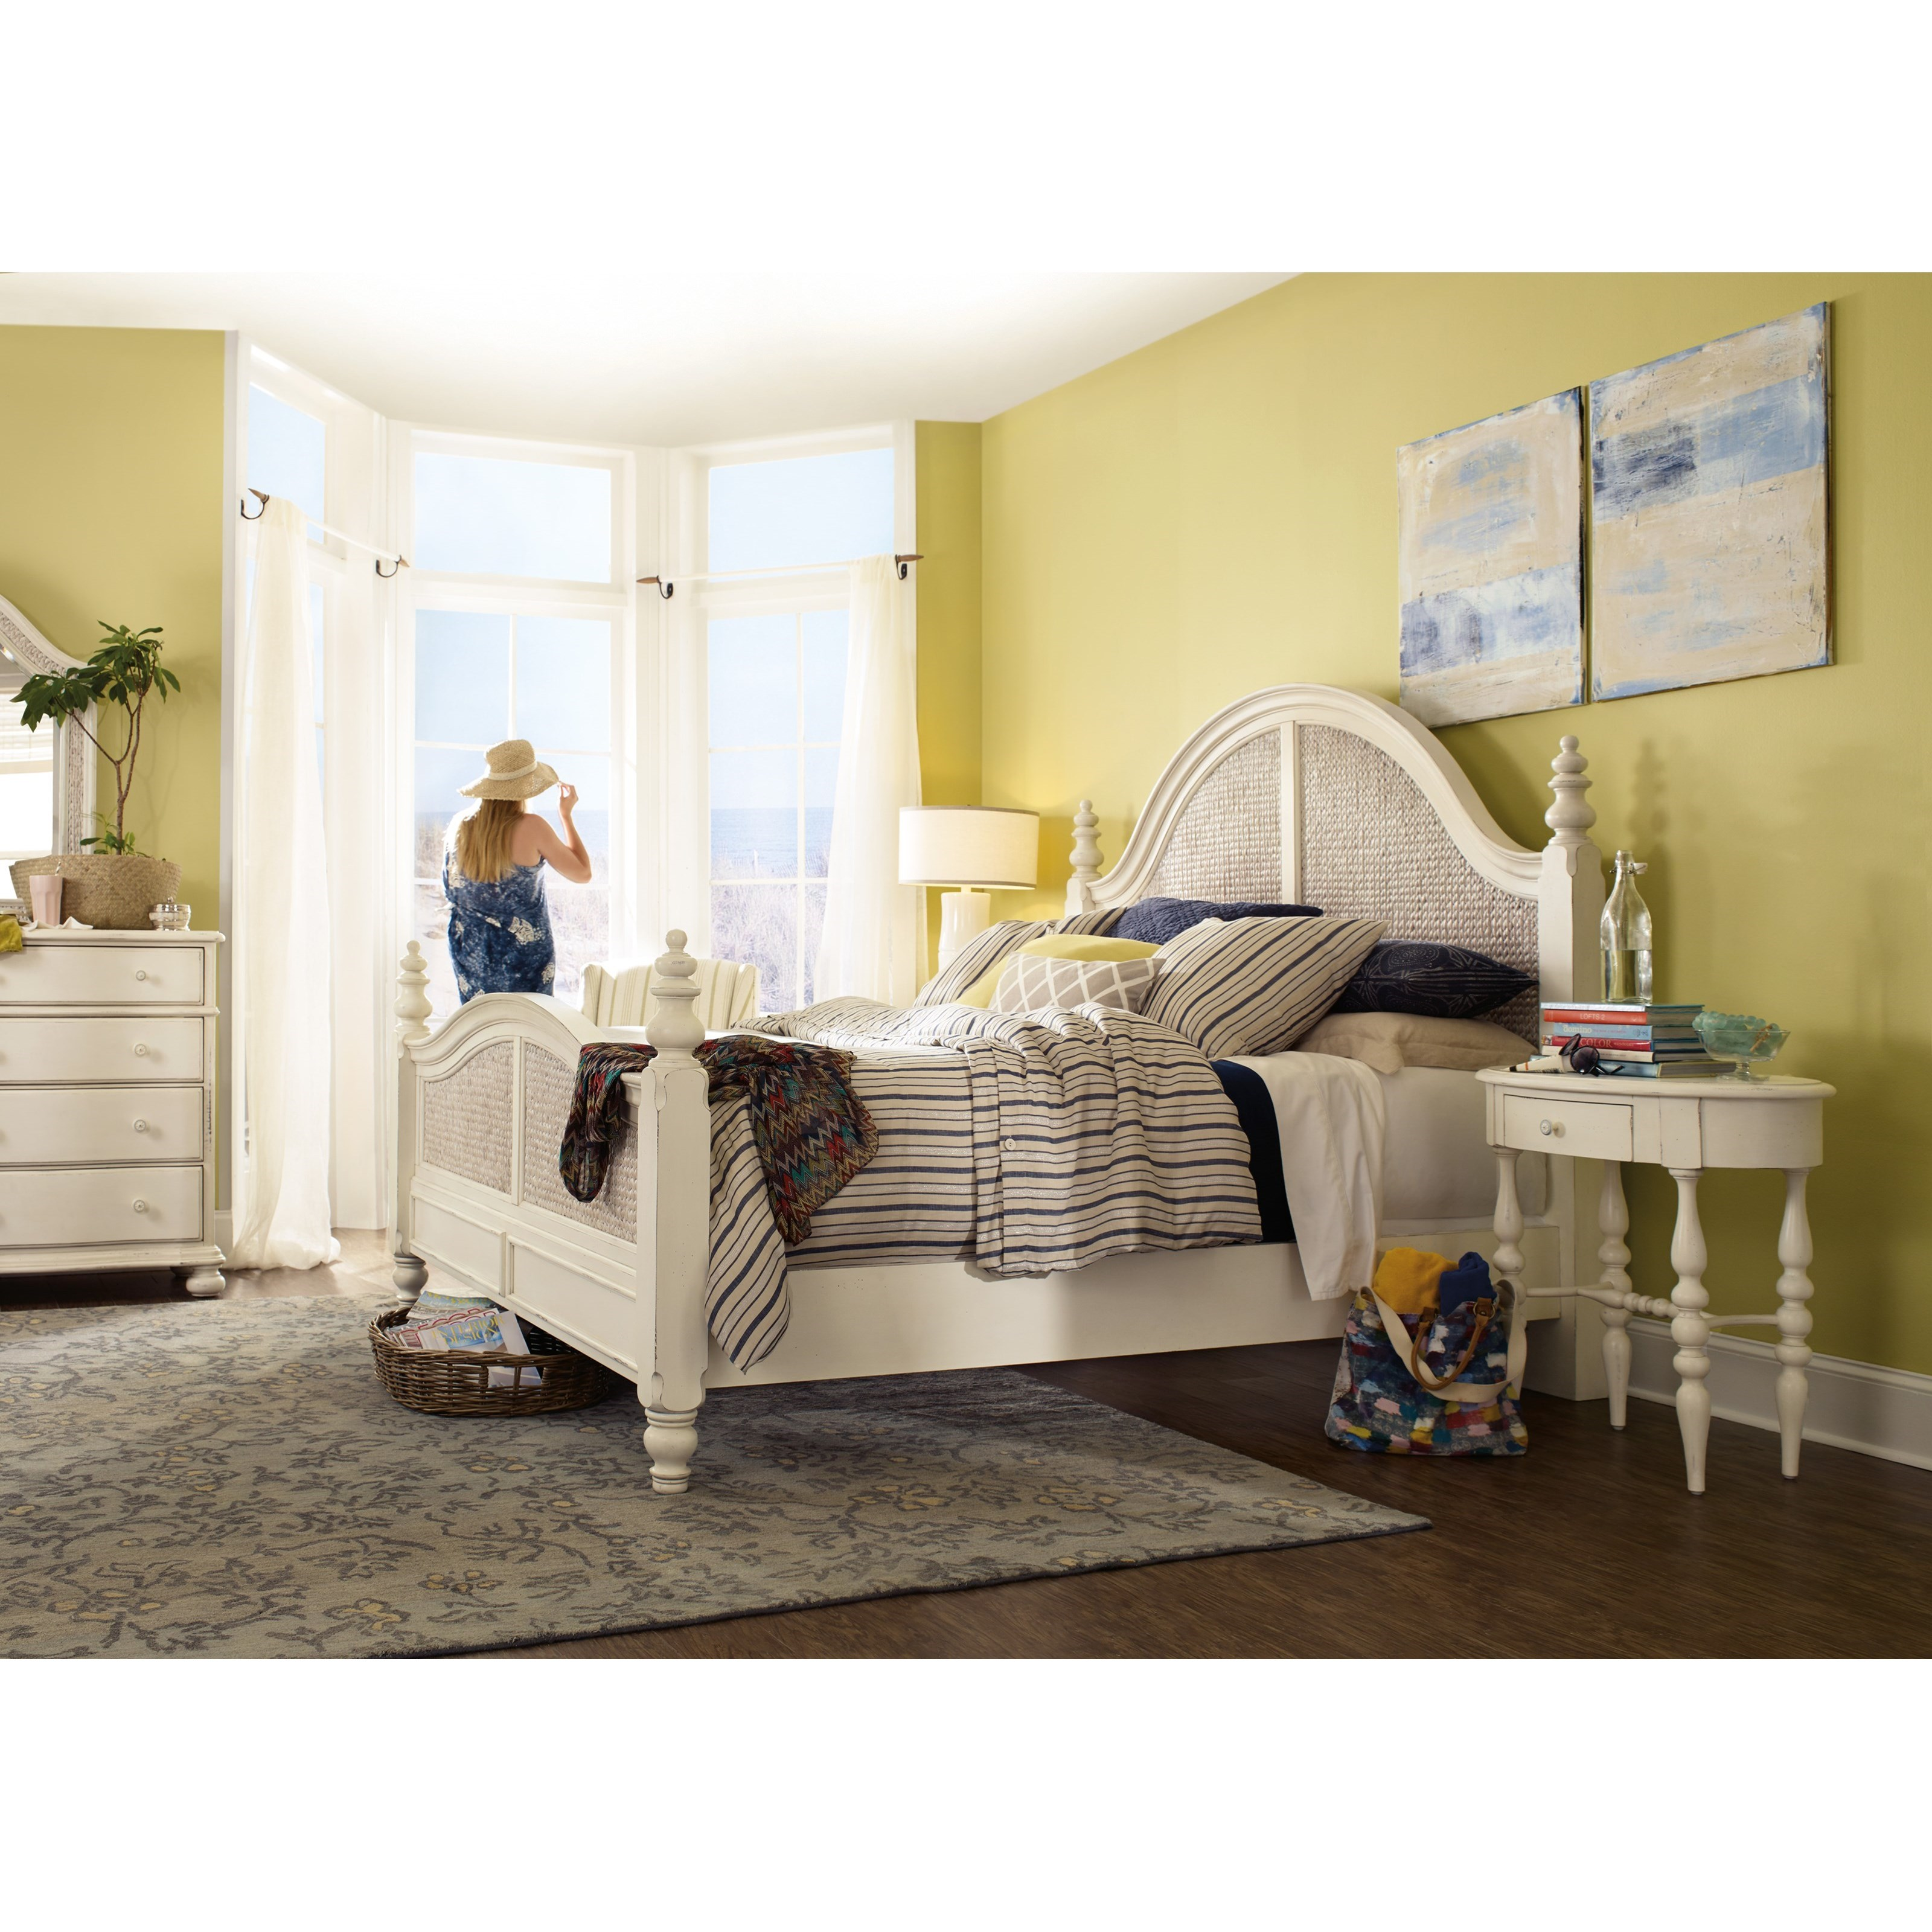 Hooker Furniture Sandcastle Queen Sea Grass Woven Panel Bed Jacksonville Furniture Mart